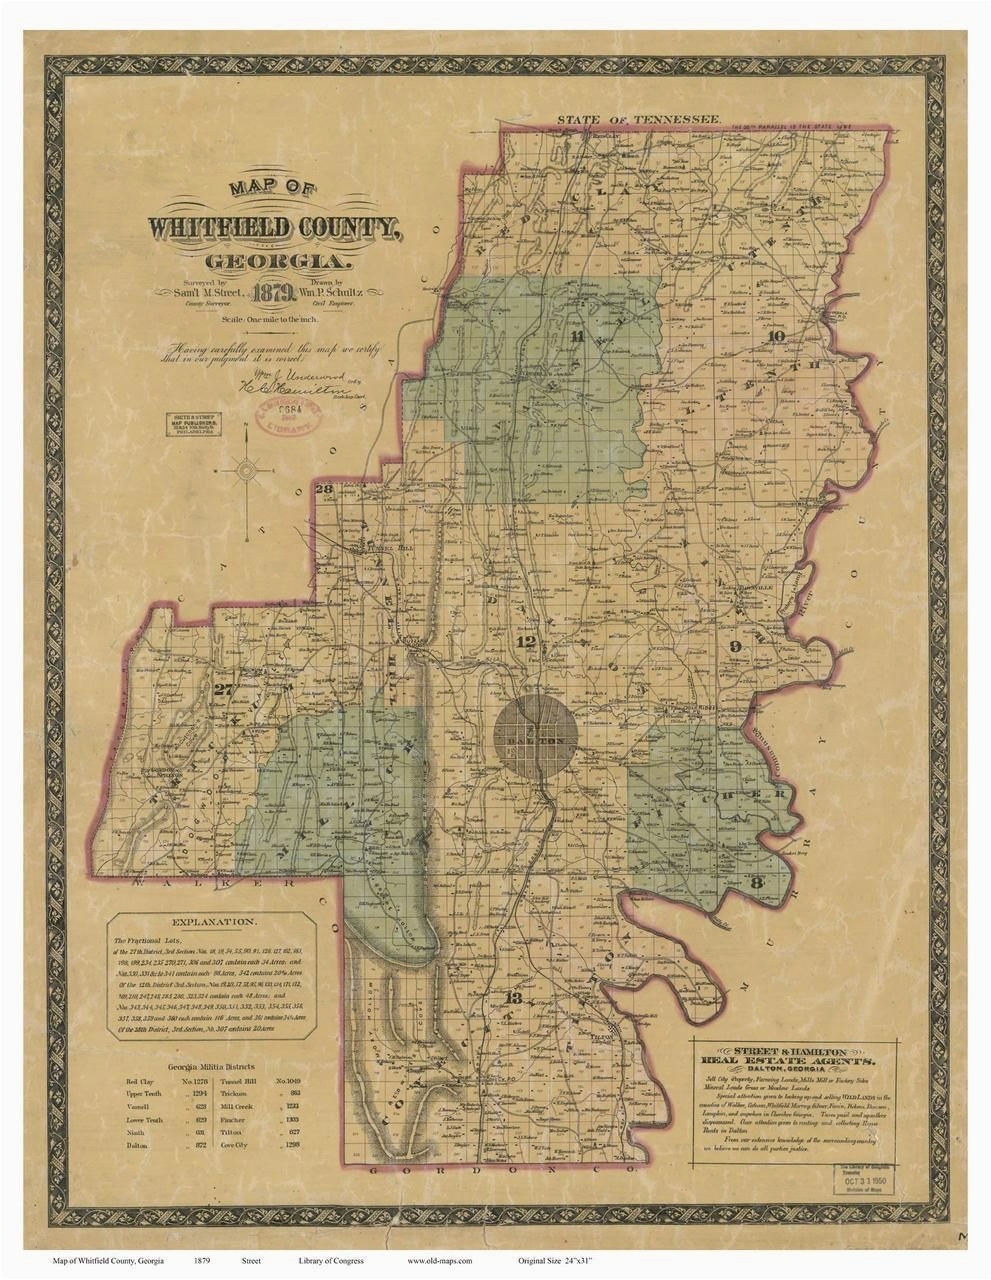 Old Maps Of Georgia Whitfield County 1879 Georgia Old Maps Of Georgia Pinterest